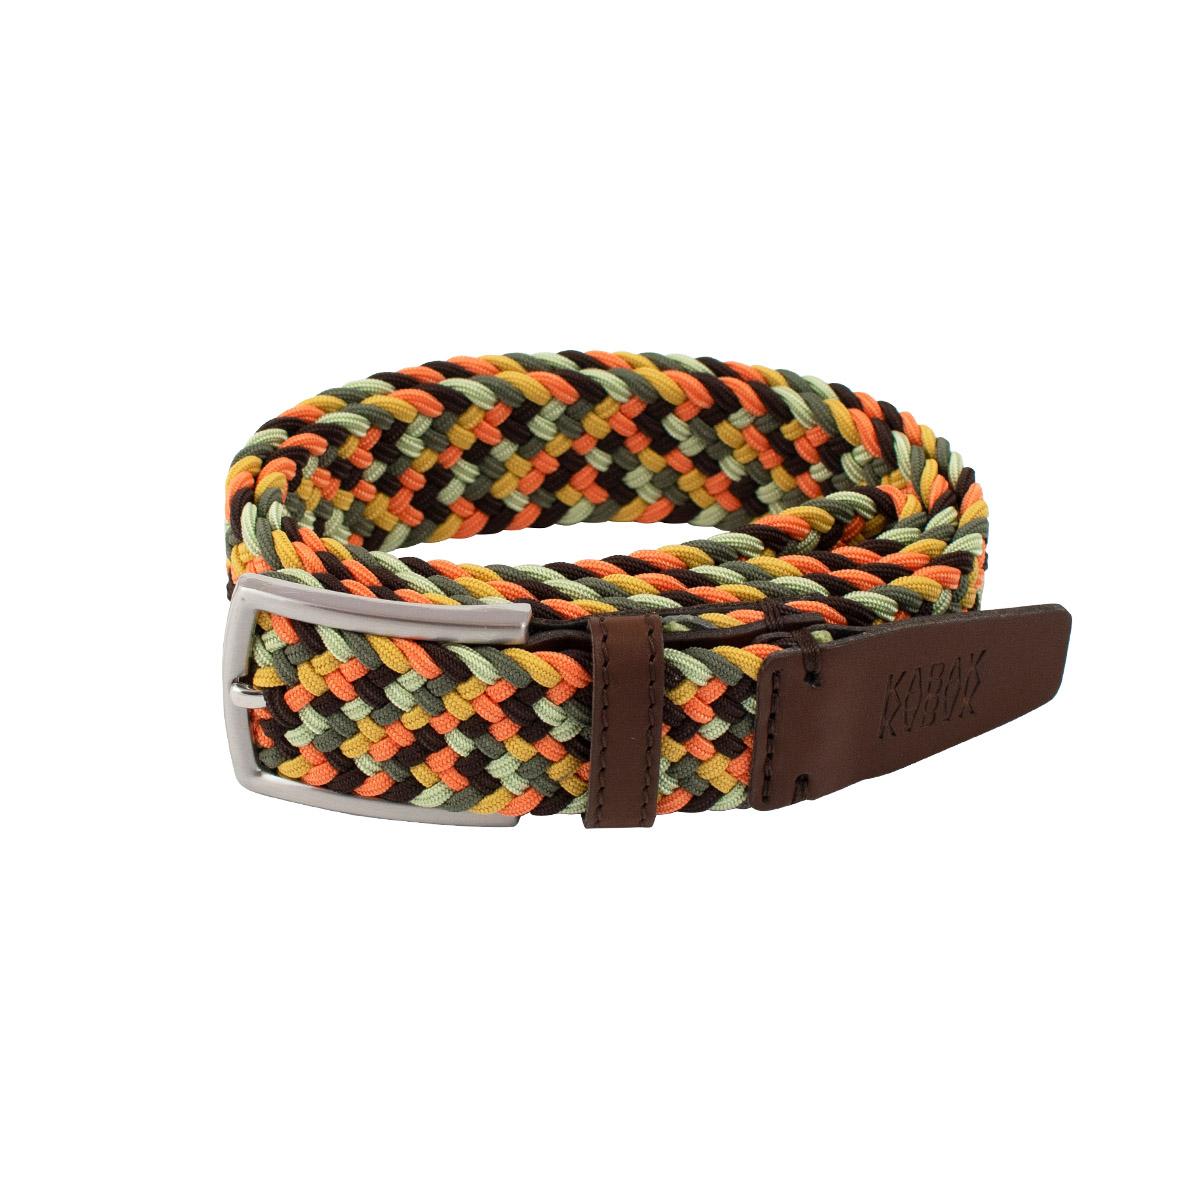 belt_woven_multicolor_A159_kabak_5906742649581_5906742649598 (1)